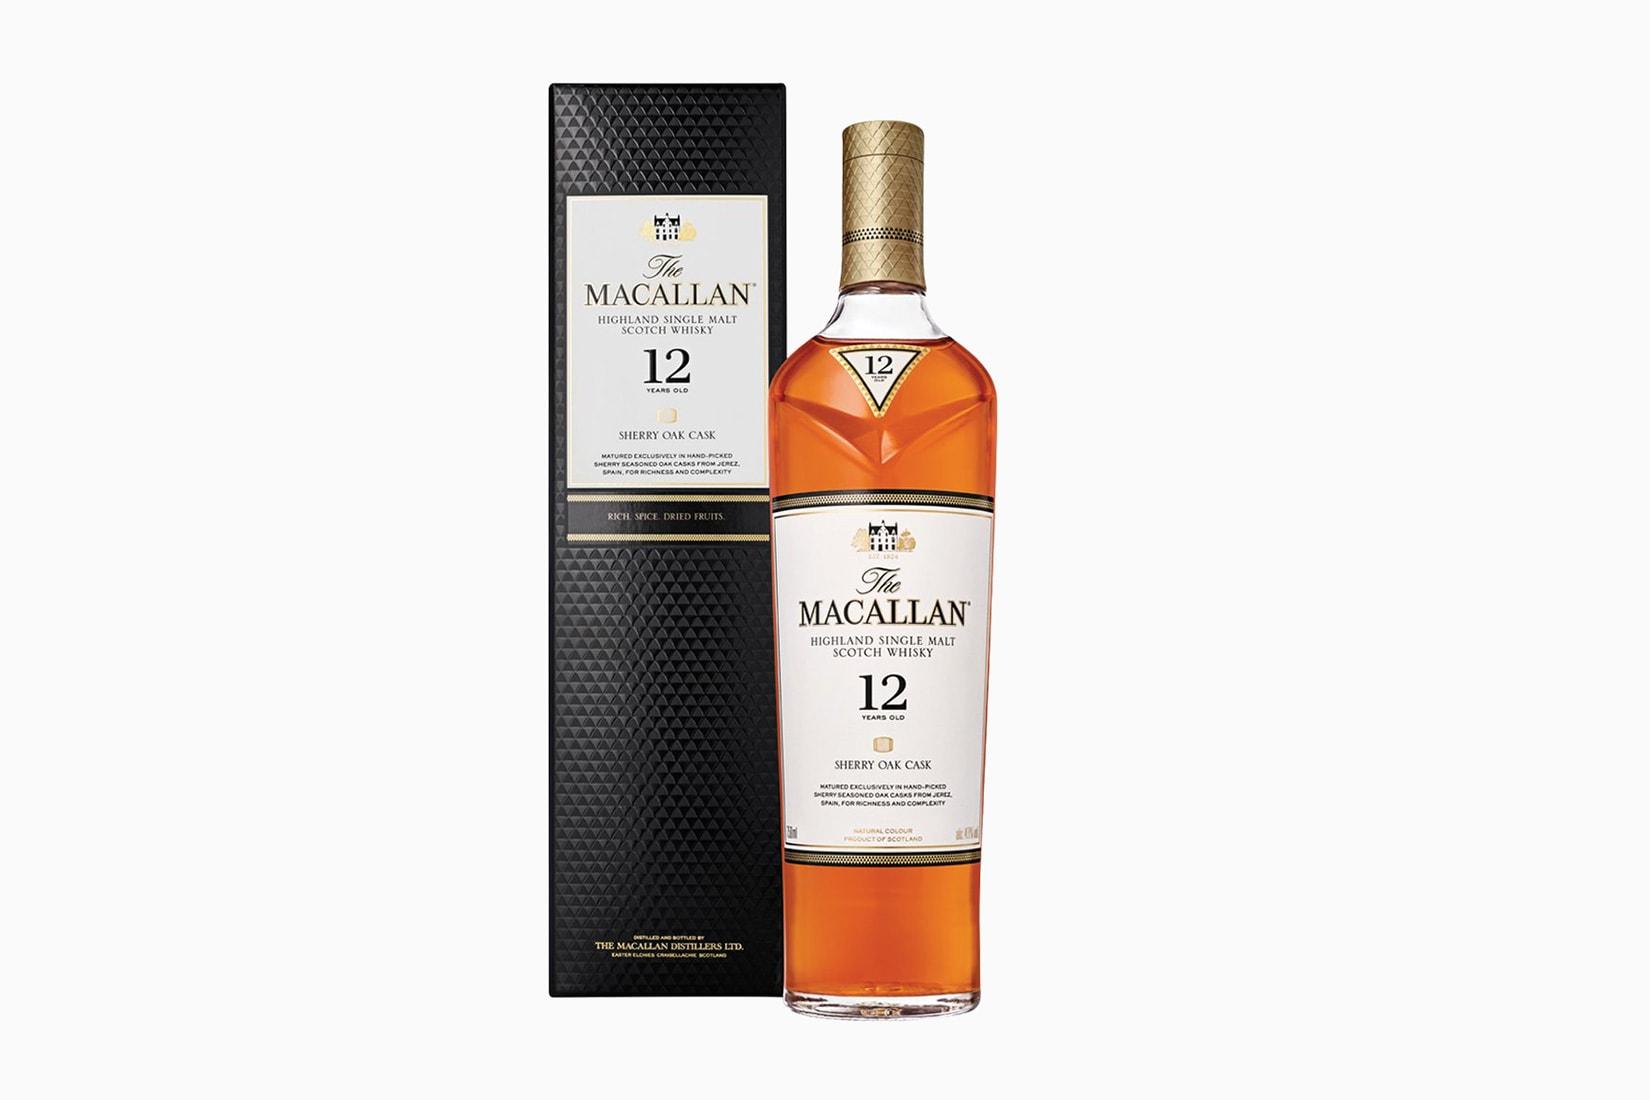 whisky escocés macallan 12 años botella precio tamaño - Luxe Digital